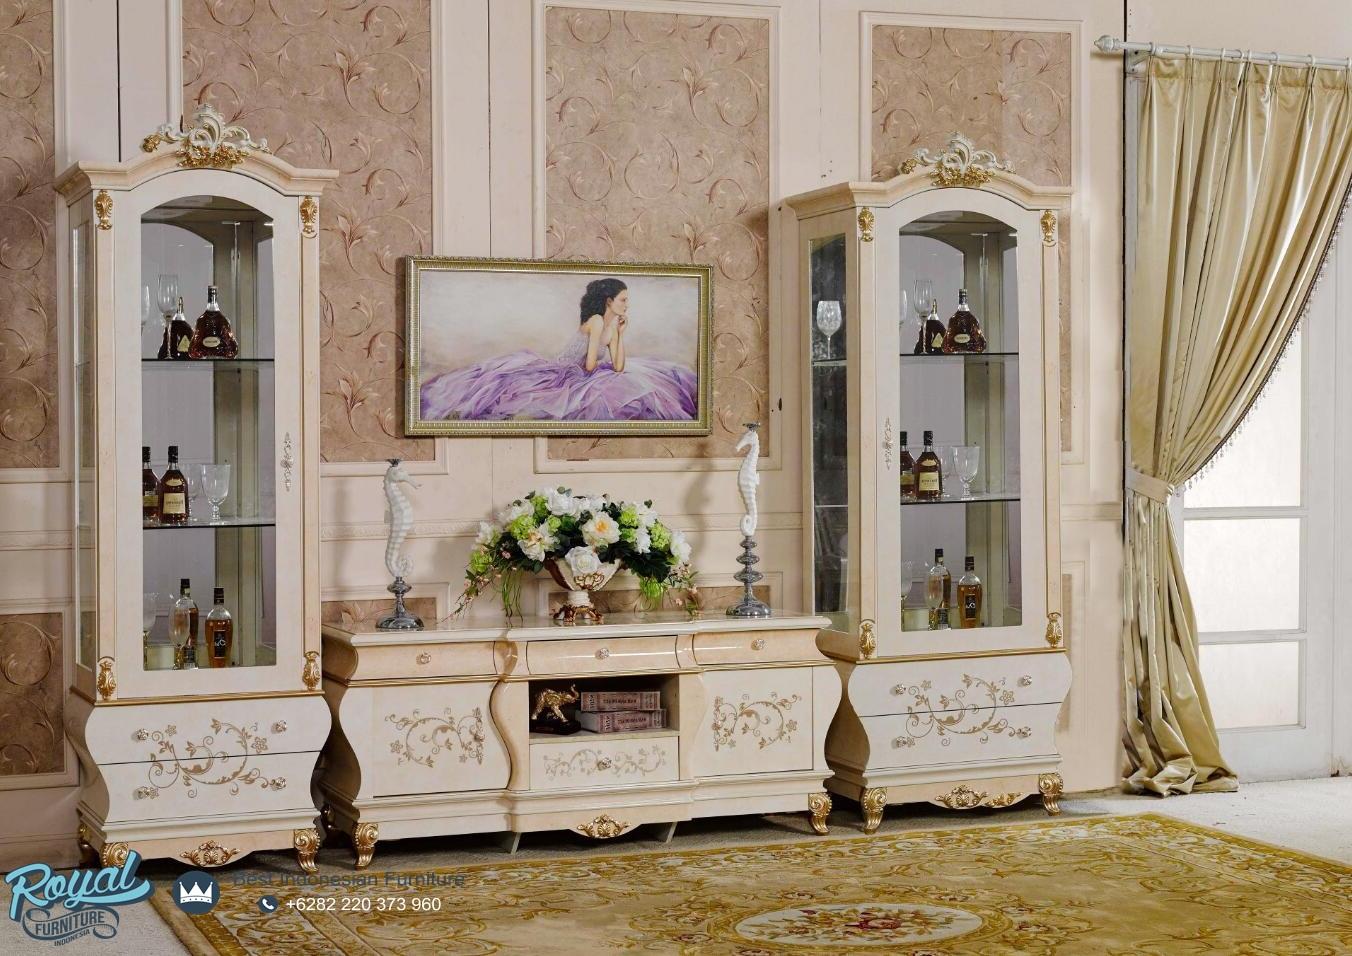 Bufet Tv Set Modern Mewah Terbaru Teodora Royal Furniture Indonesia # Teodora Muebles